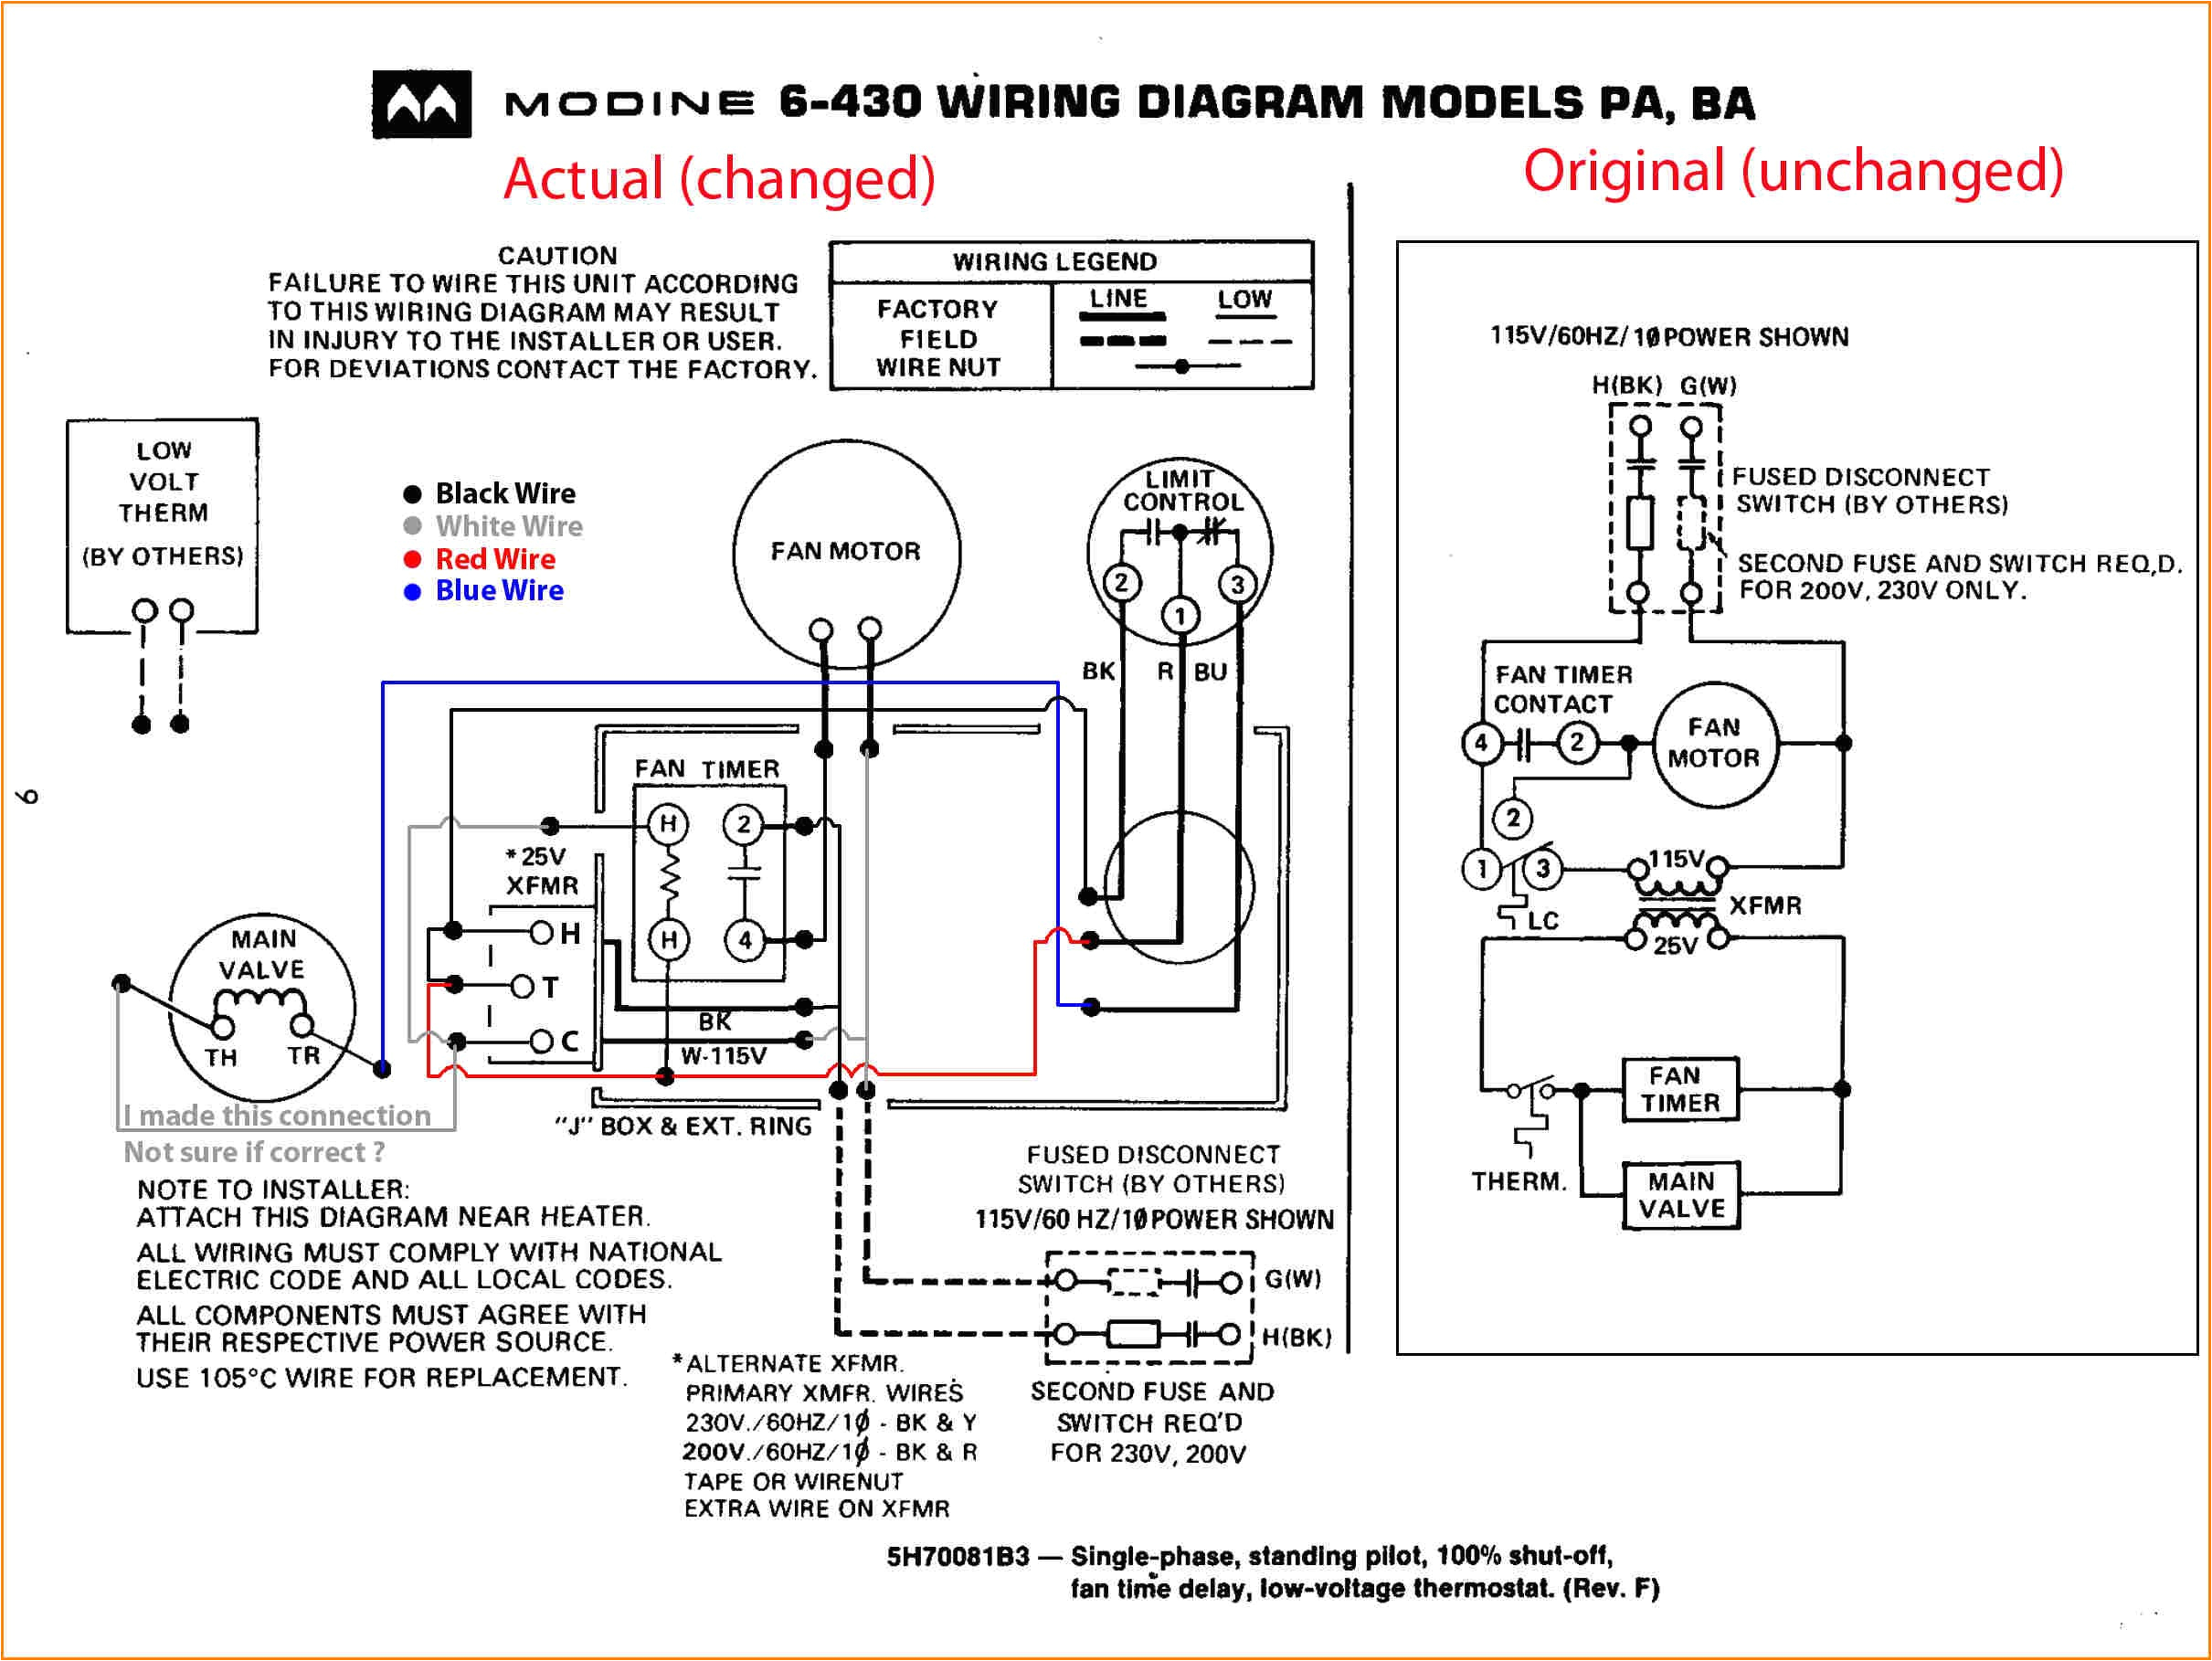 honeywell fan limit switch wiring diagram hvac relay wiring diagram data schematics wiring diagram e280a2 of honeywell fan limit switch wiring diagram jpg